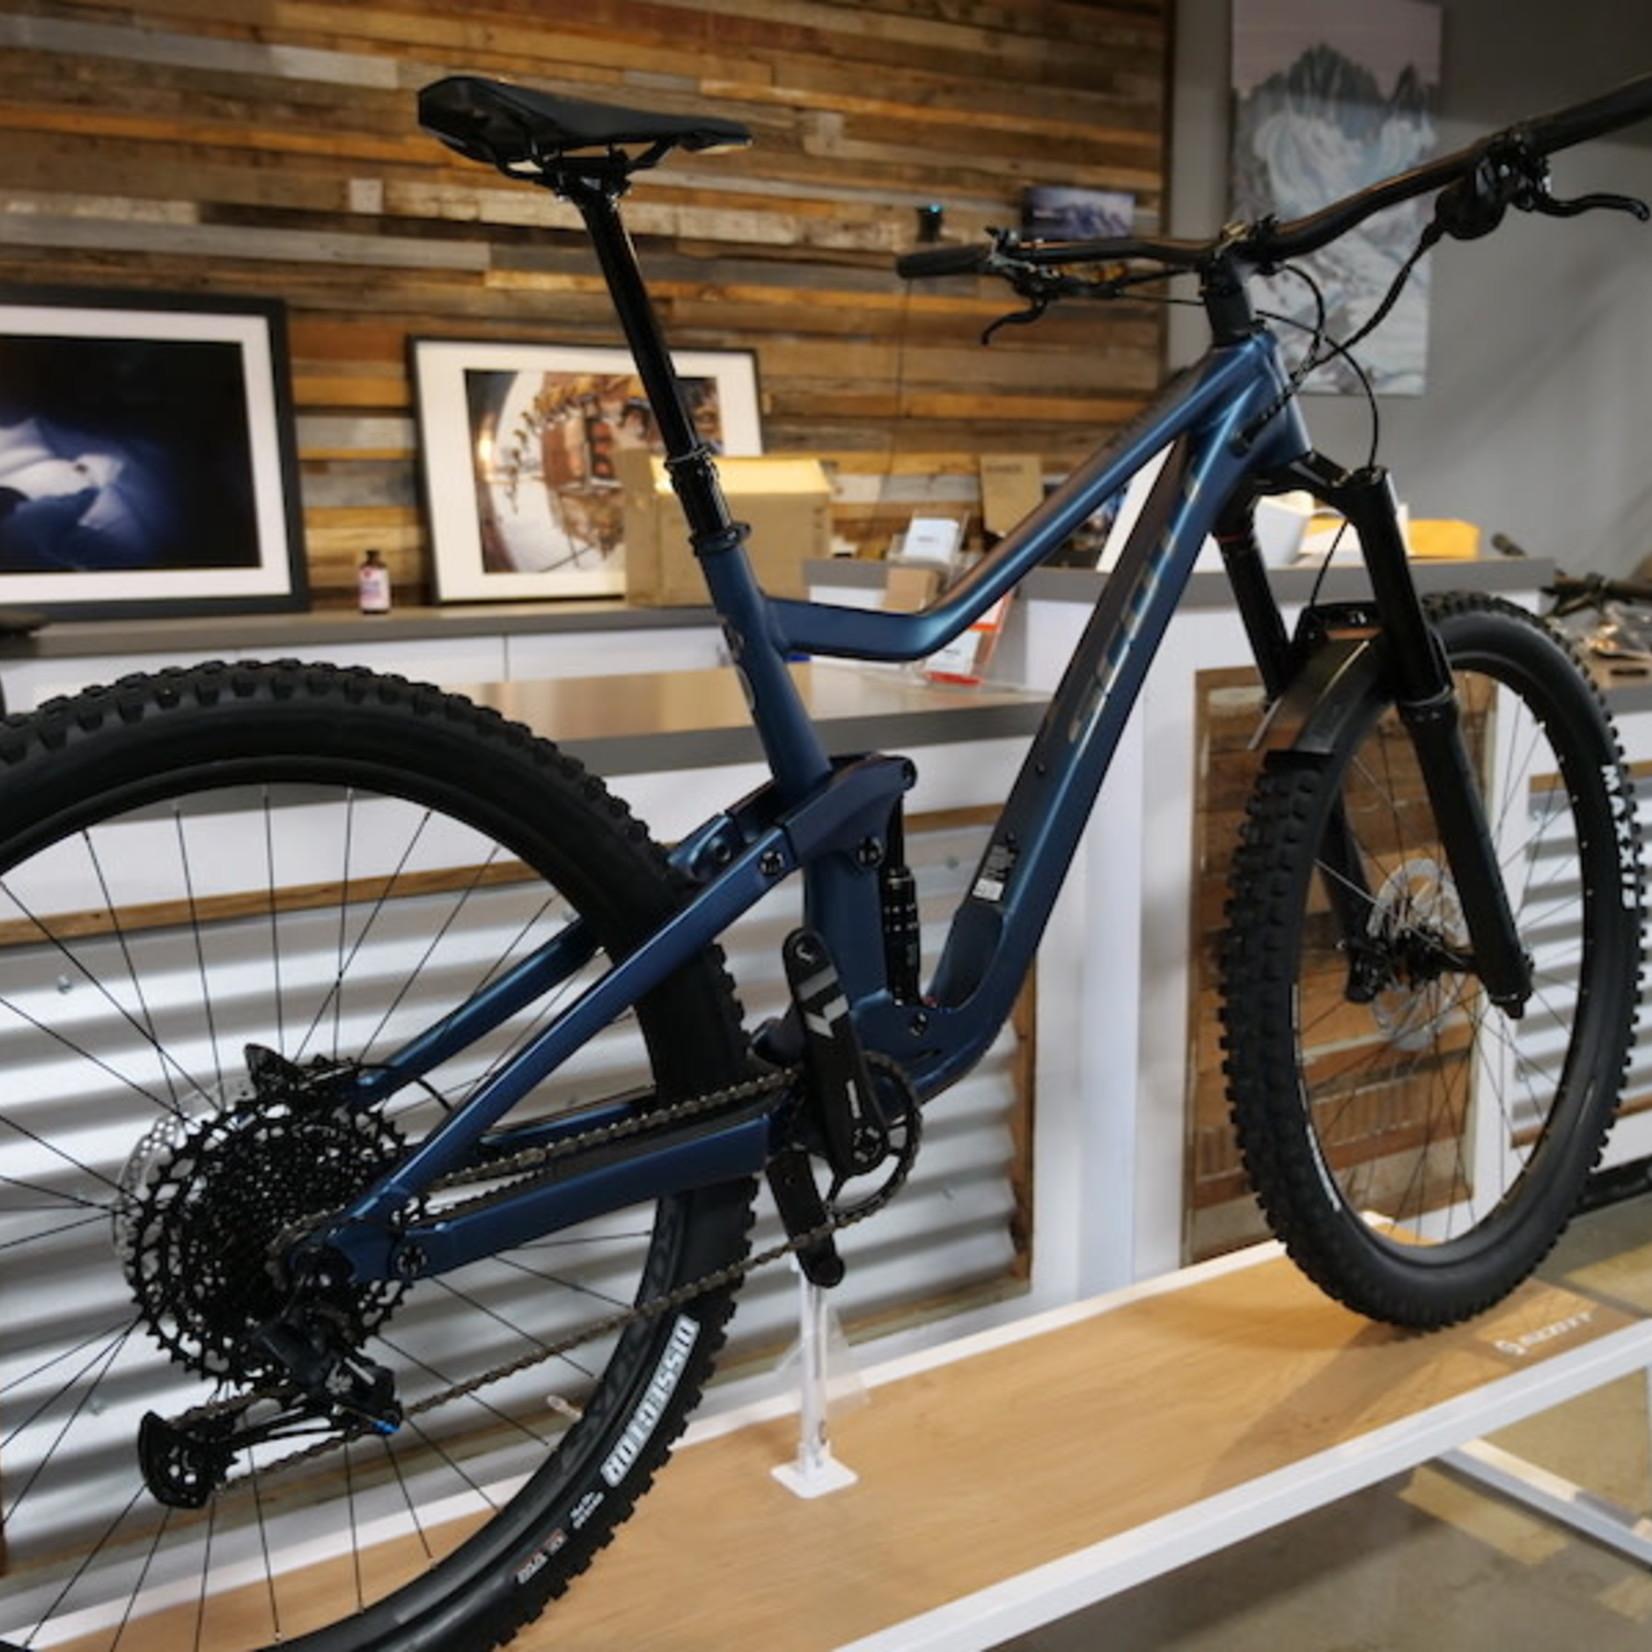 Scott SCO Bike Ransom 930